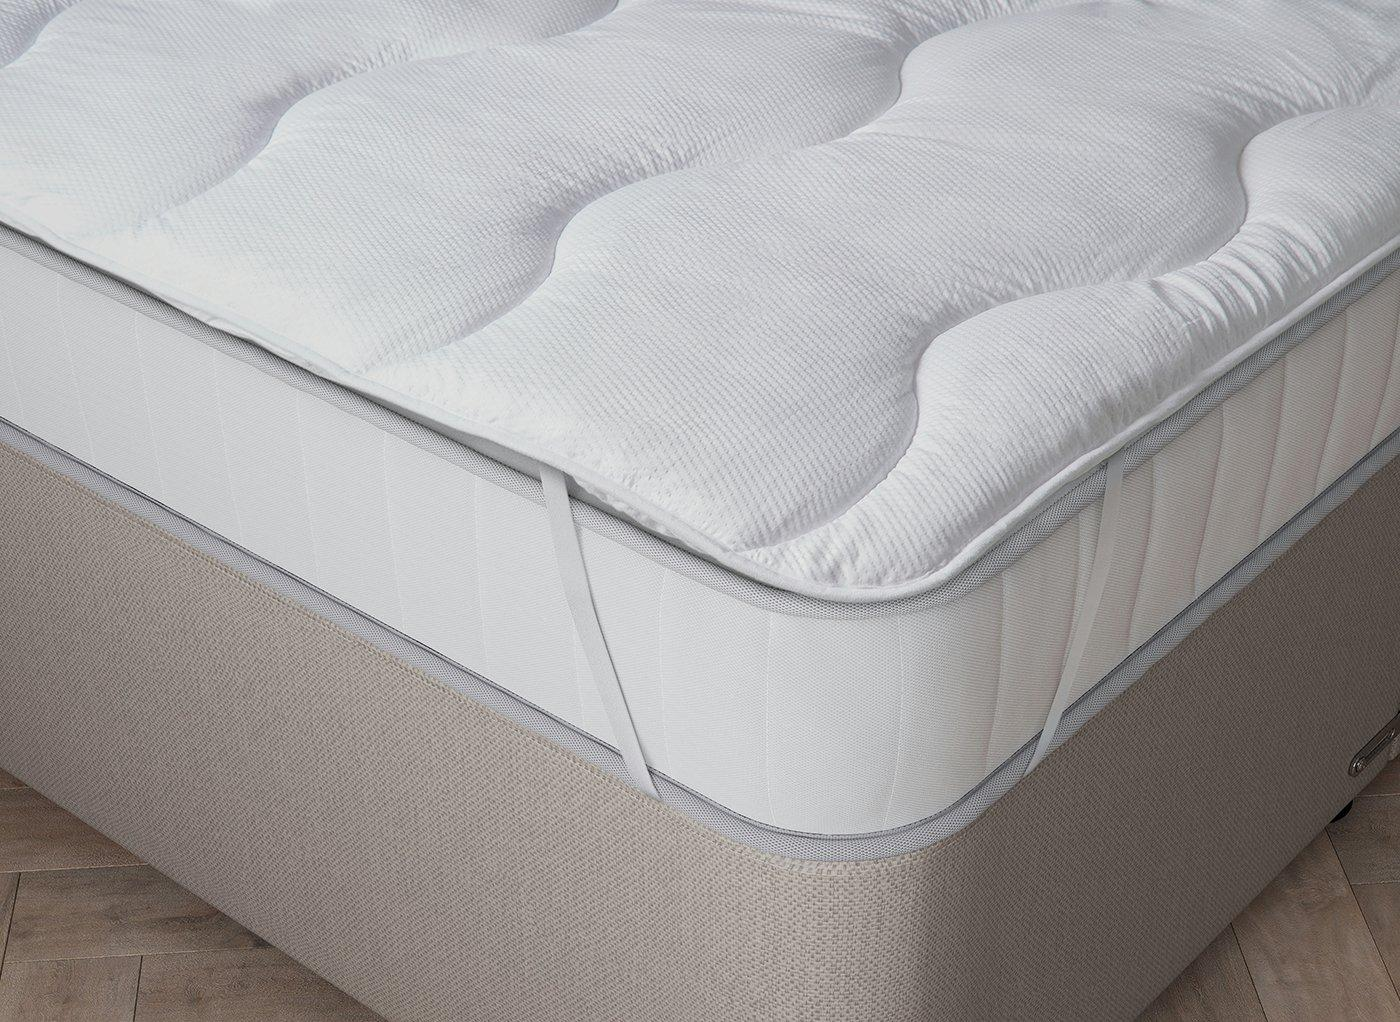 Doze Ultra Soft Washable Topper S 3'0 Single